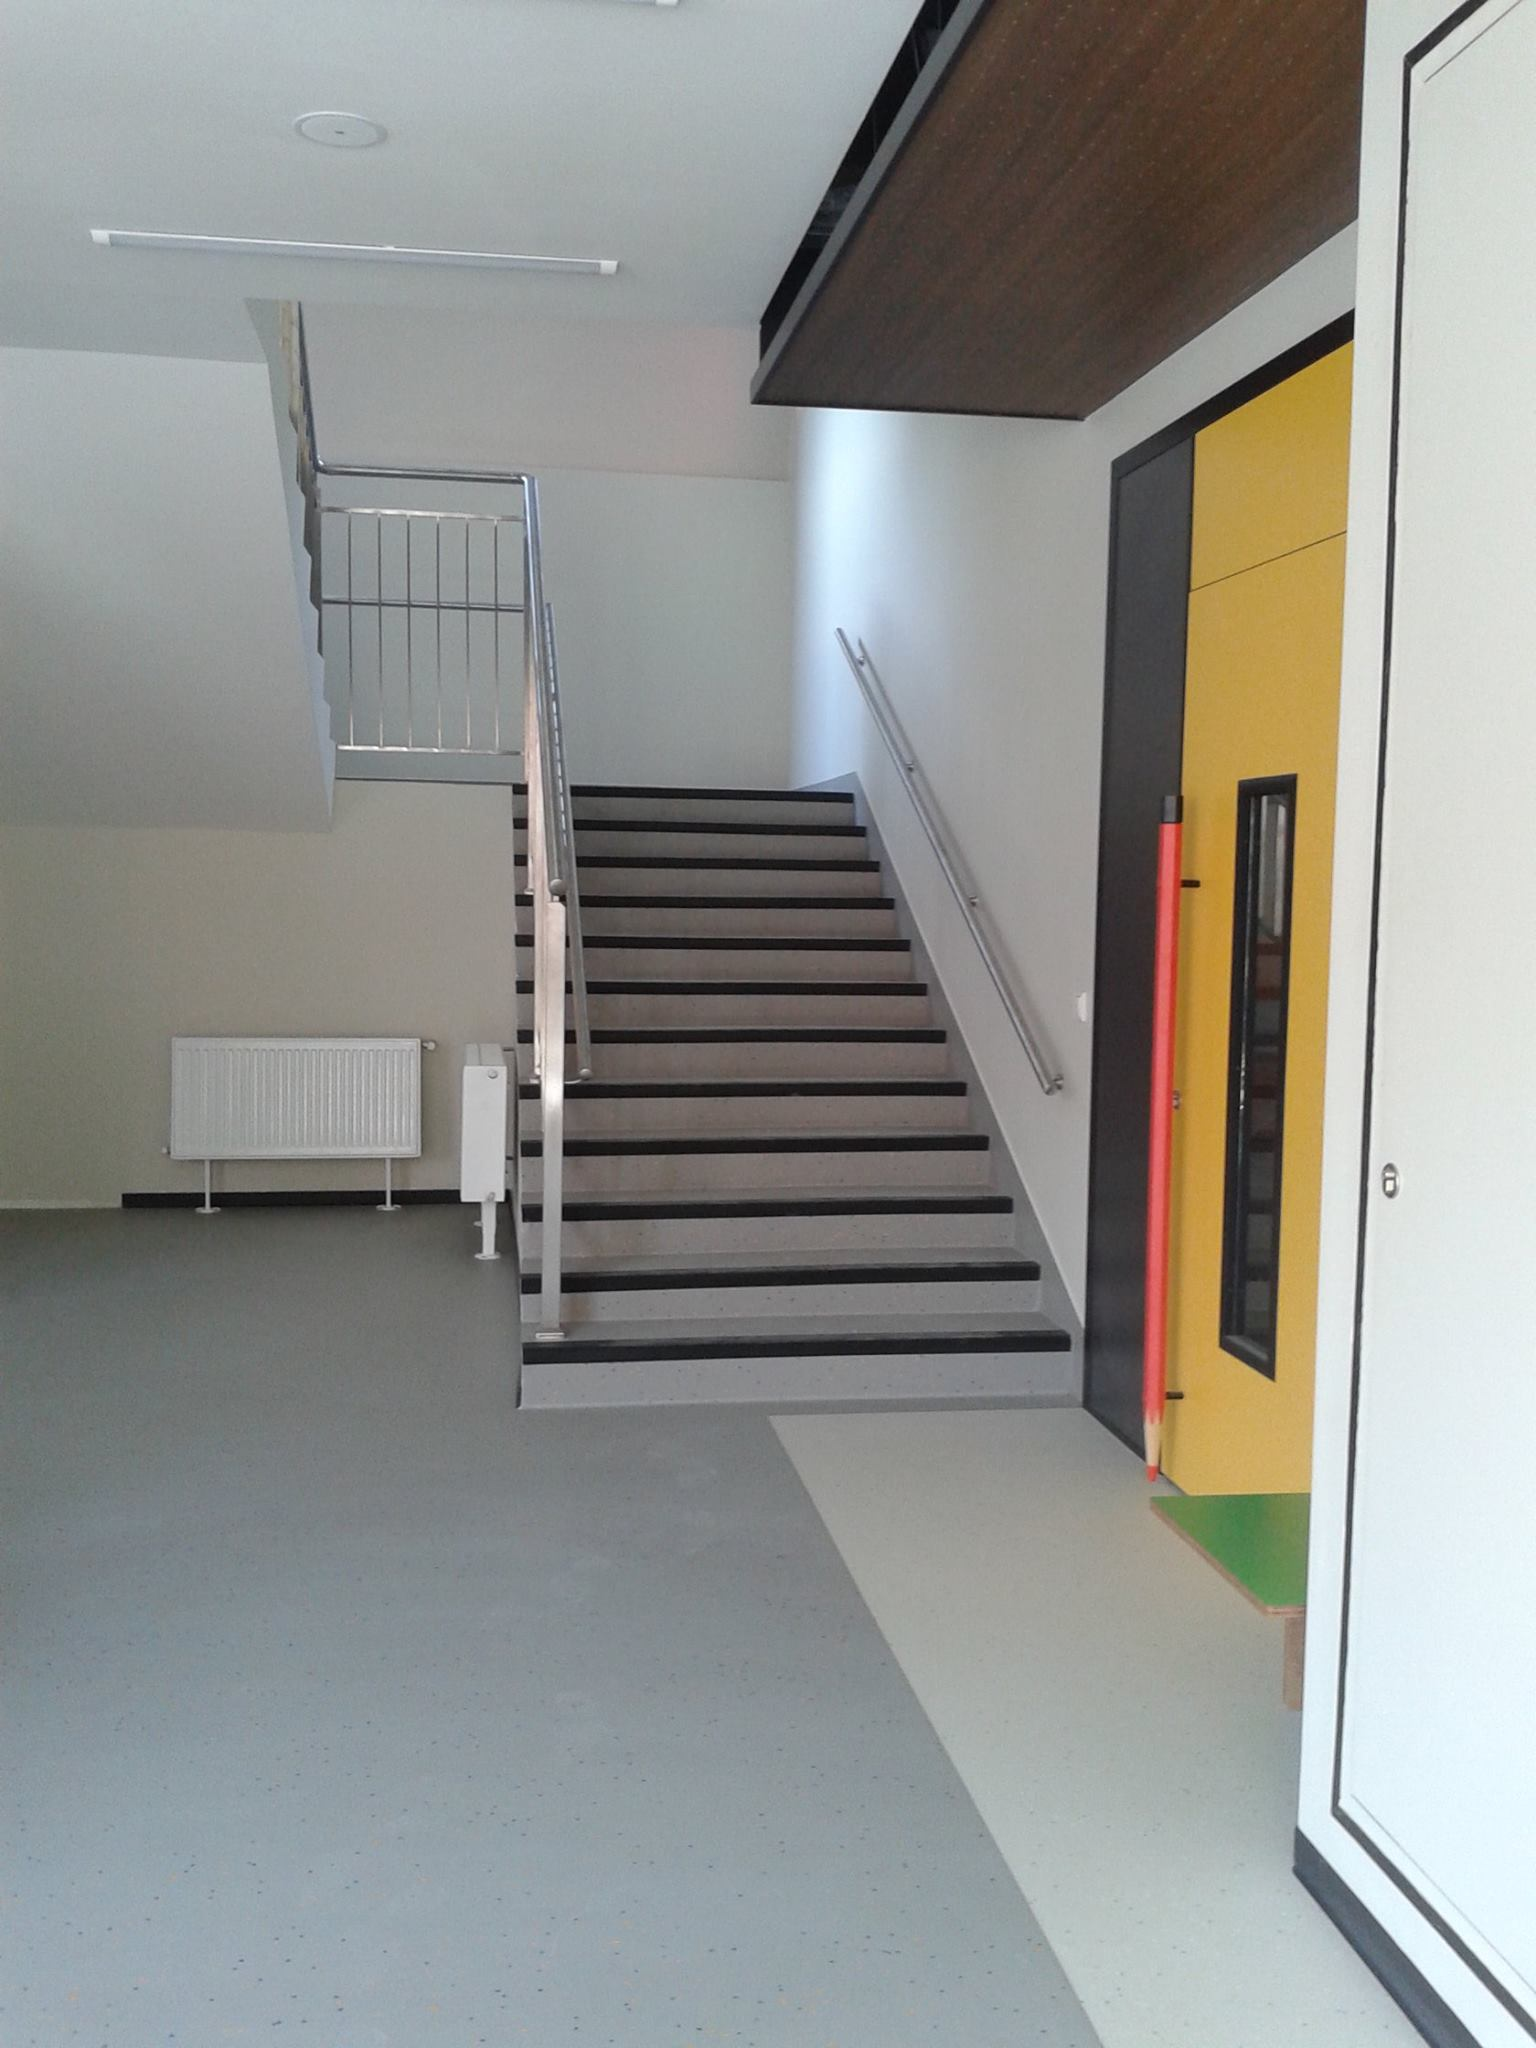 Cum arat n interior cea mai modern institu ie de for Casa moderna in moldova